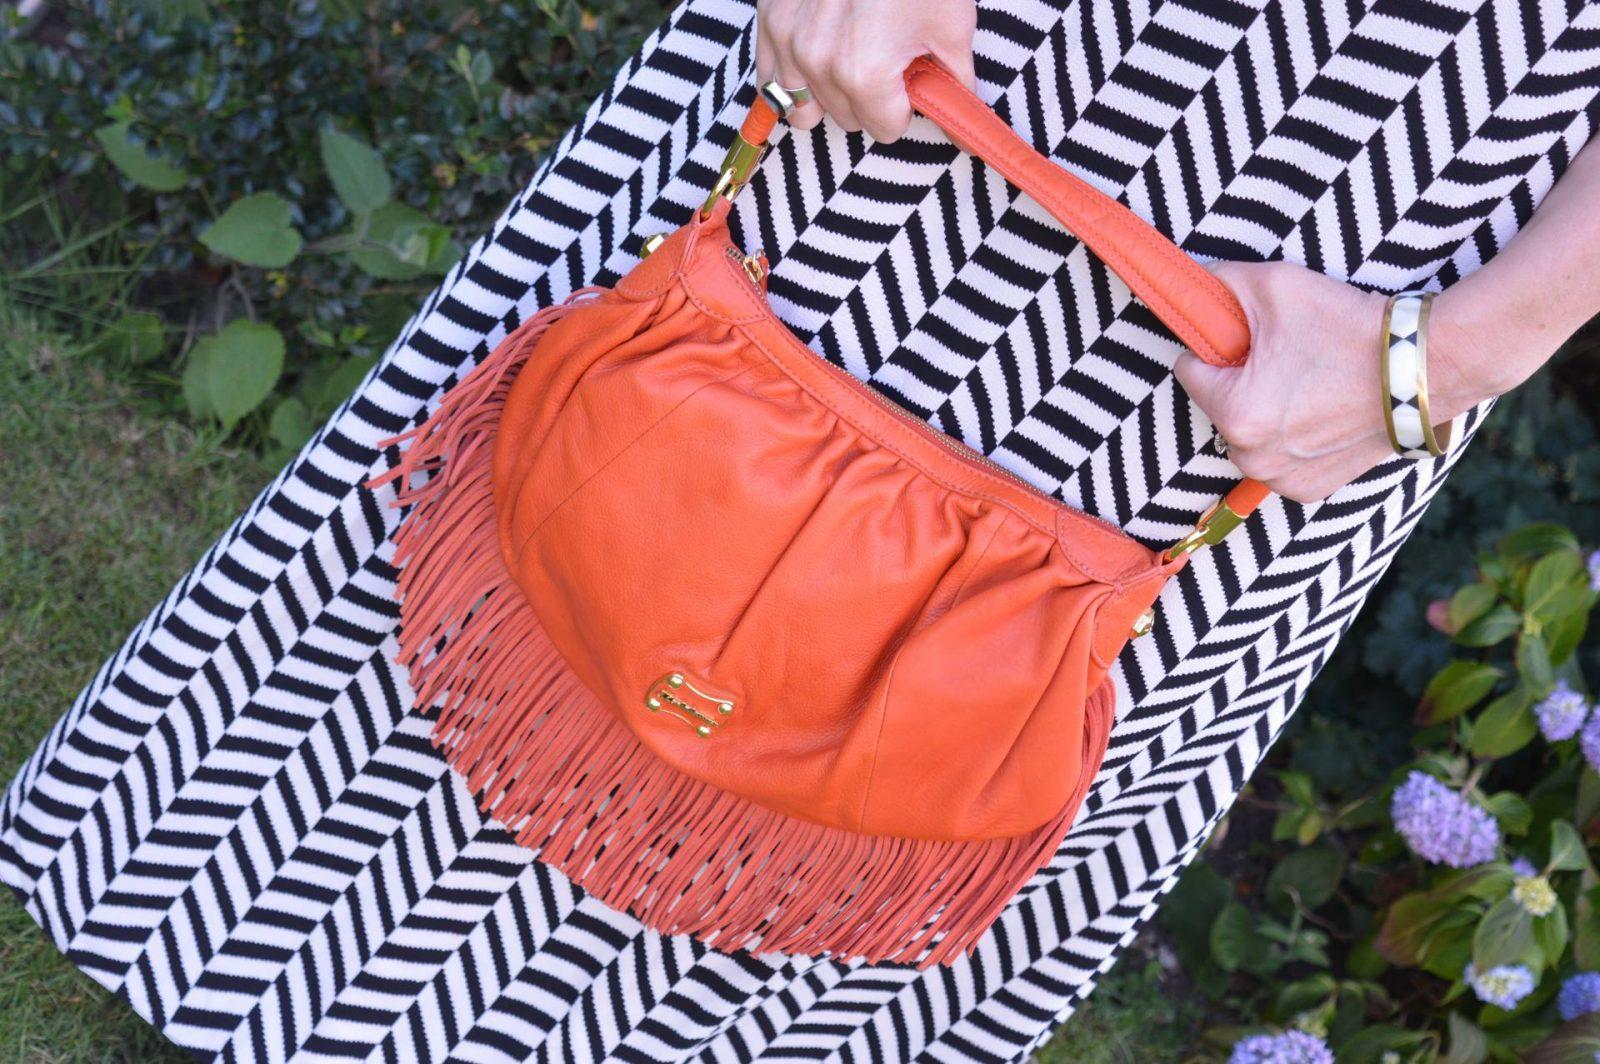 Liquorish Black and White Maxi Dress With a Wide Brim Hat orange Modalu fringe bag